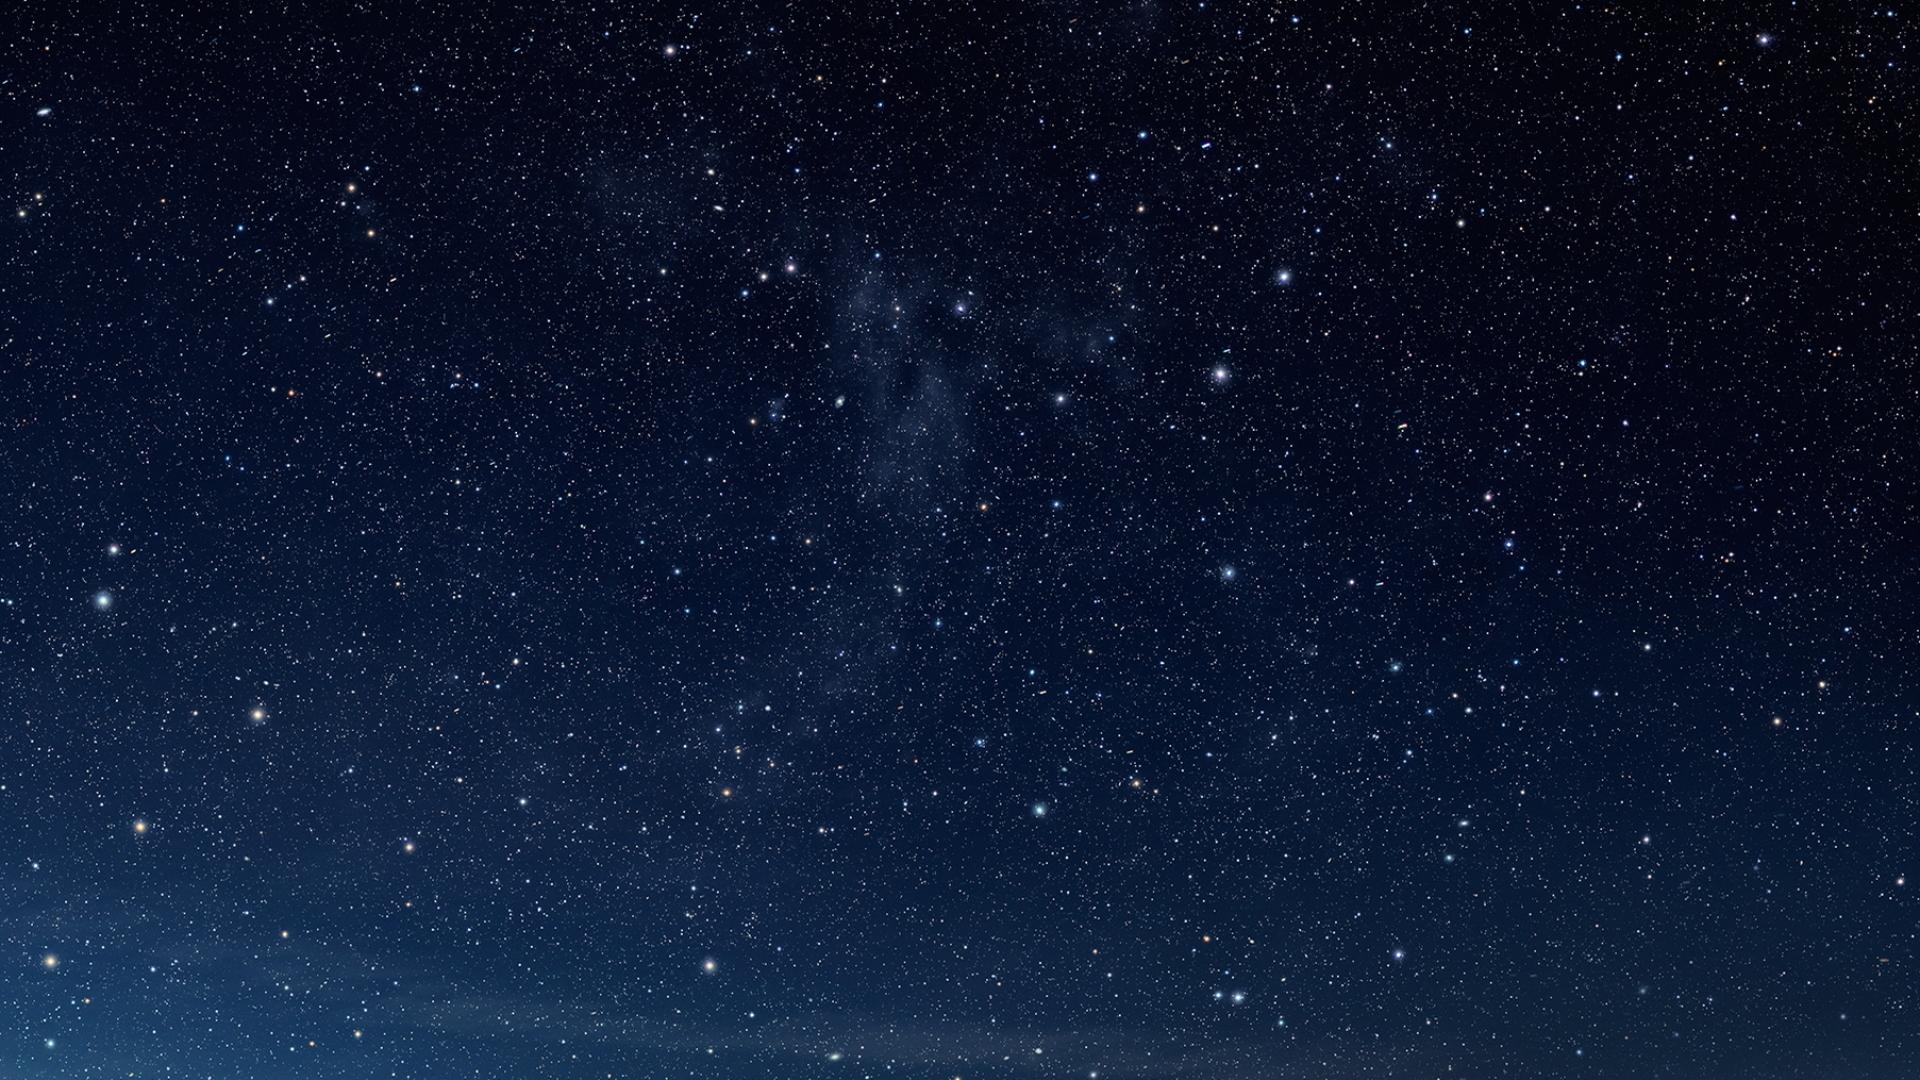 صور صور نجوم , اجمل تصاميم للنجوم